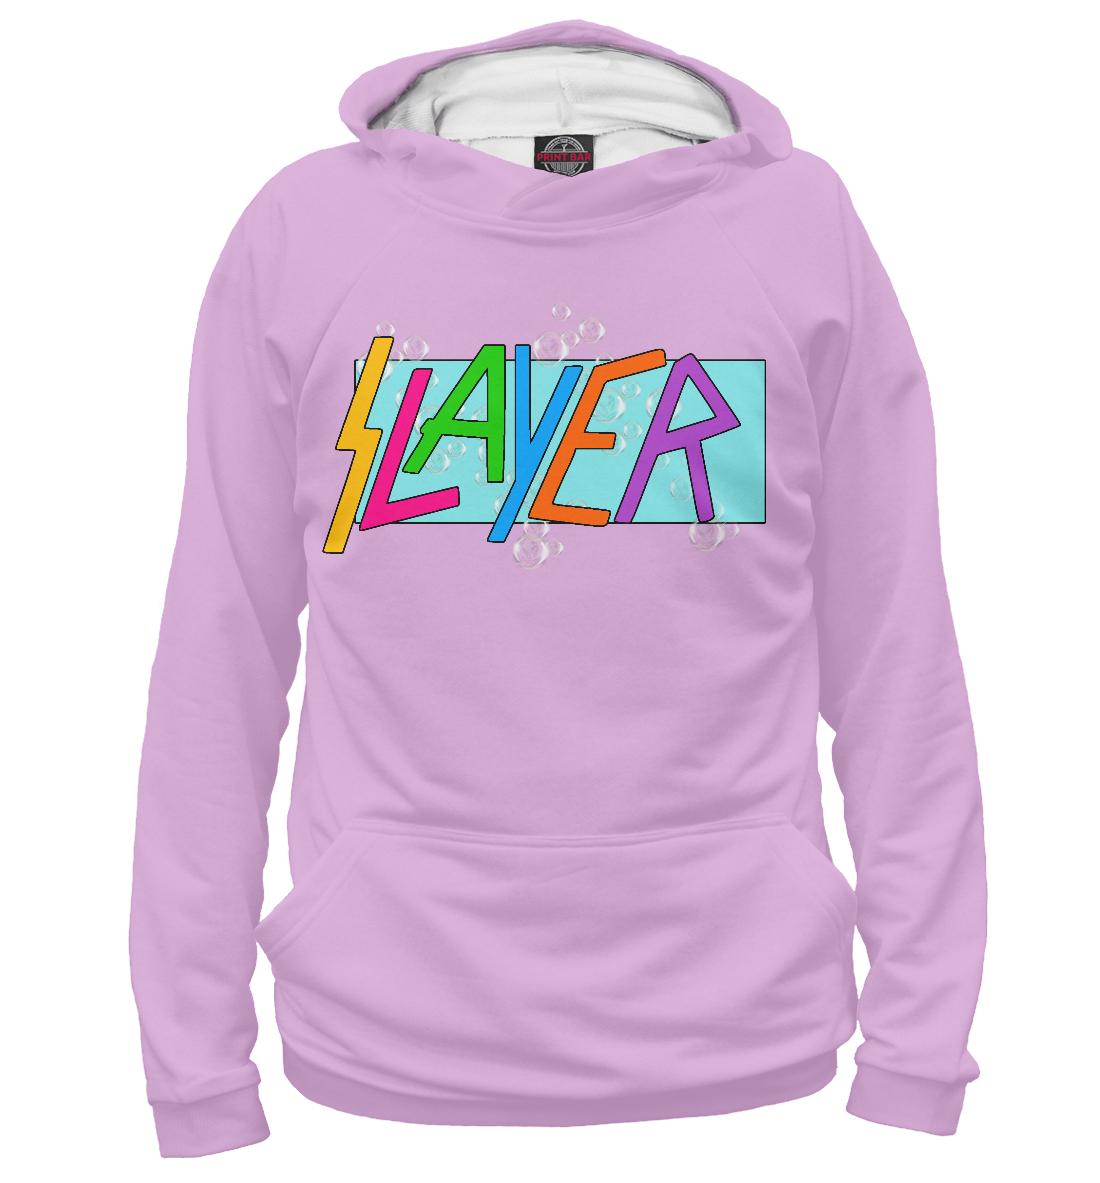 Купить Slayer, Printbar, Худи, SLR-941659-hud-2